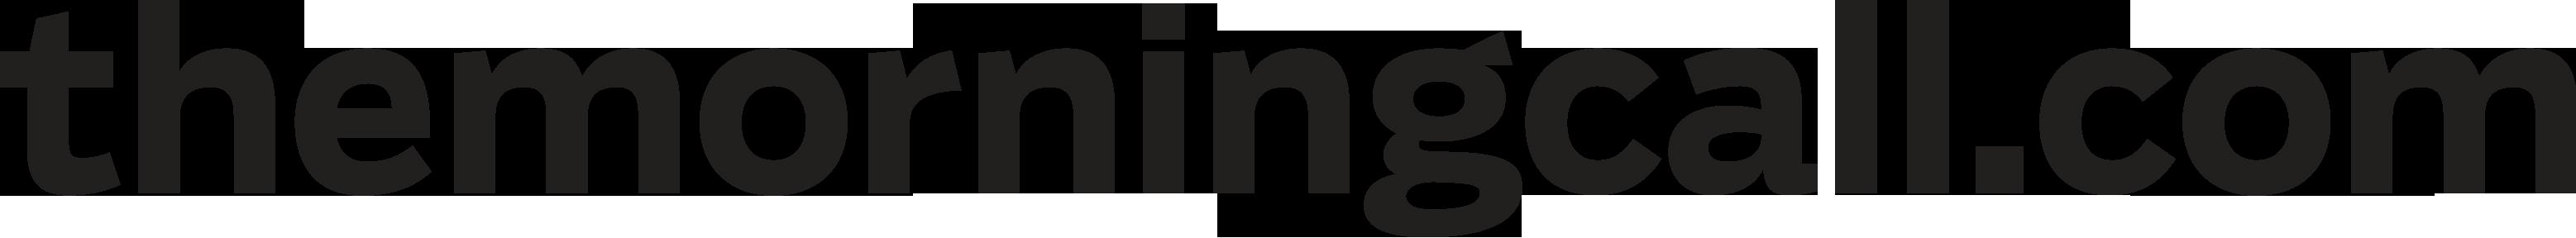 themorningcall.com